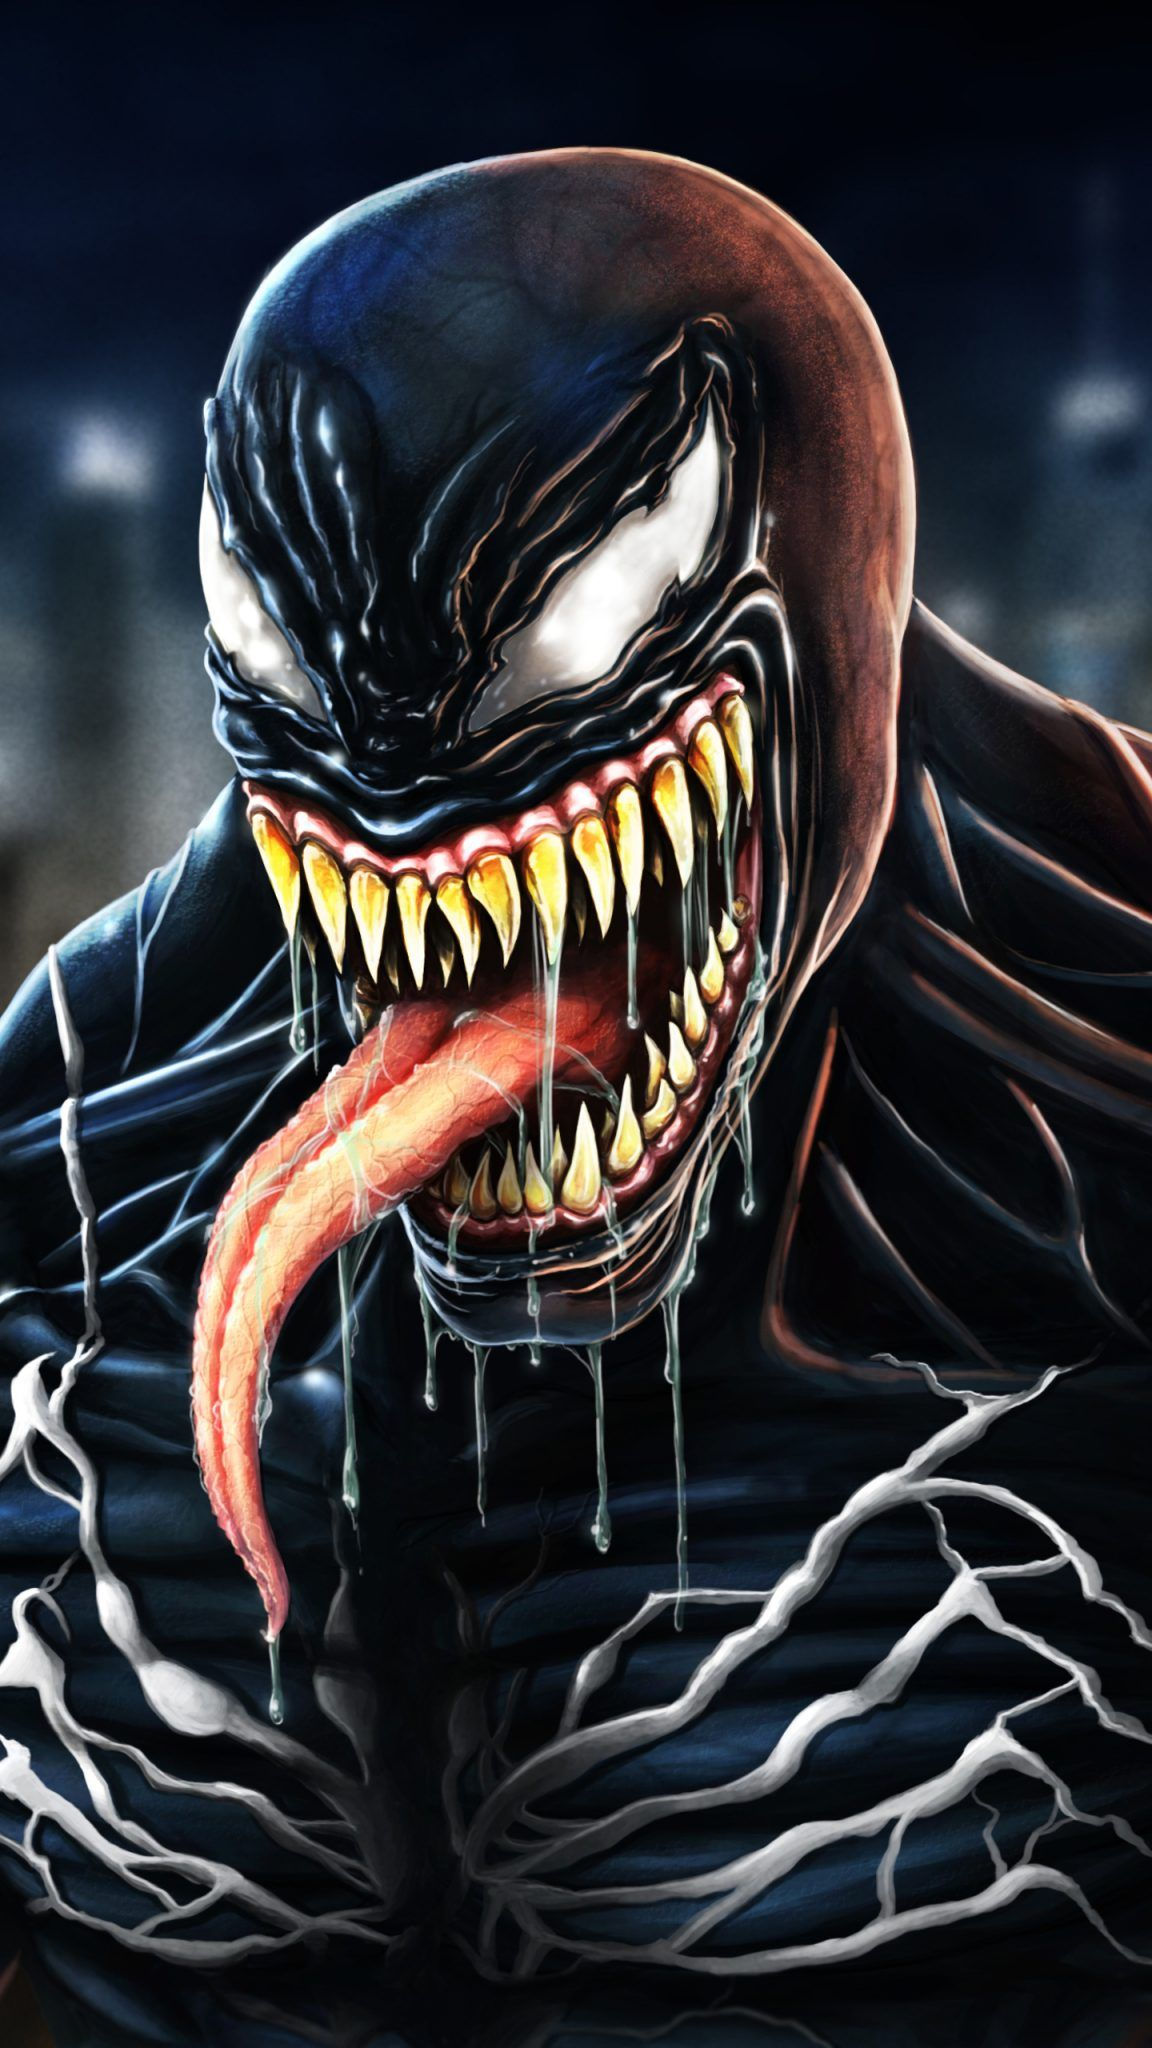 Top Venom Wallpapers For Your Pinterest Boards Venom Wallpaper Marvel Marvelcomics Spiderman Pinterest Pins Black Venom Movie Venom Venom Character